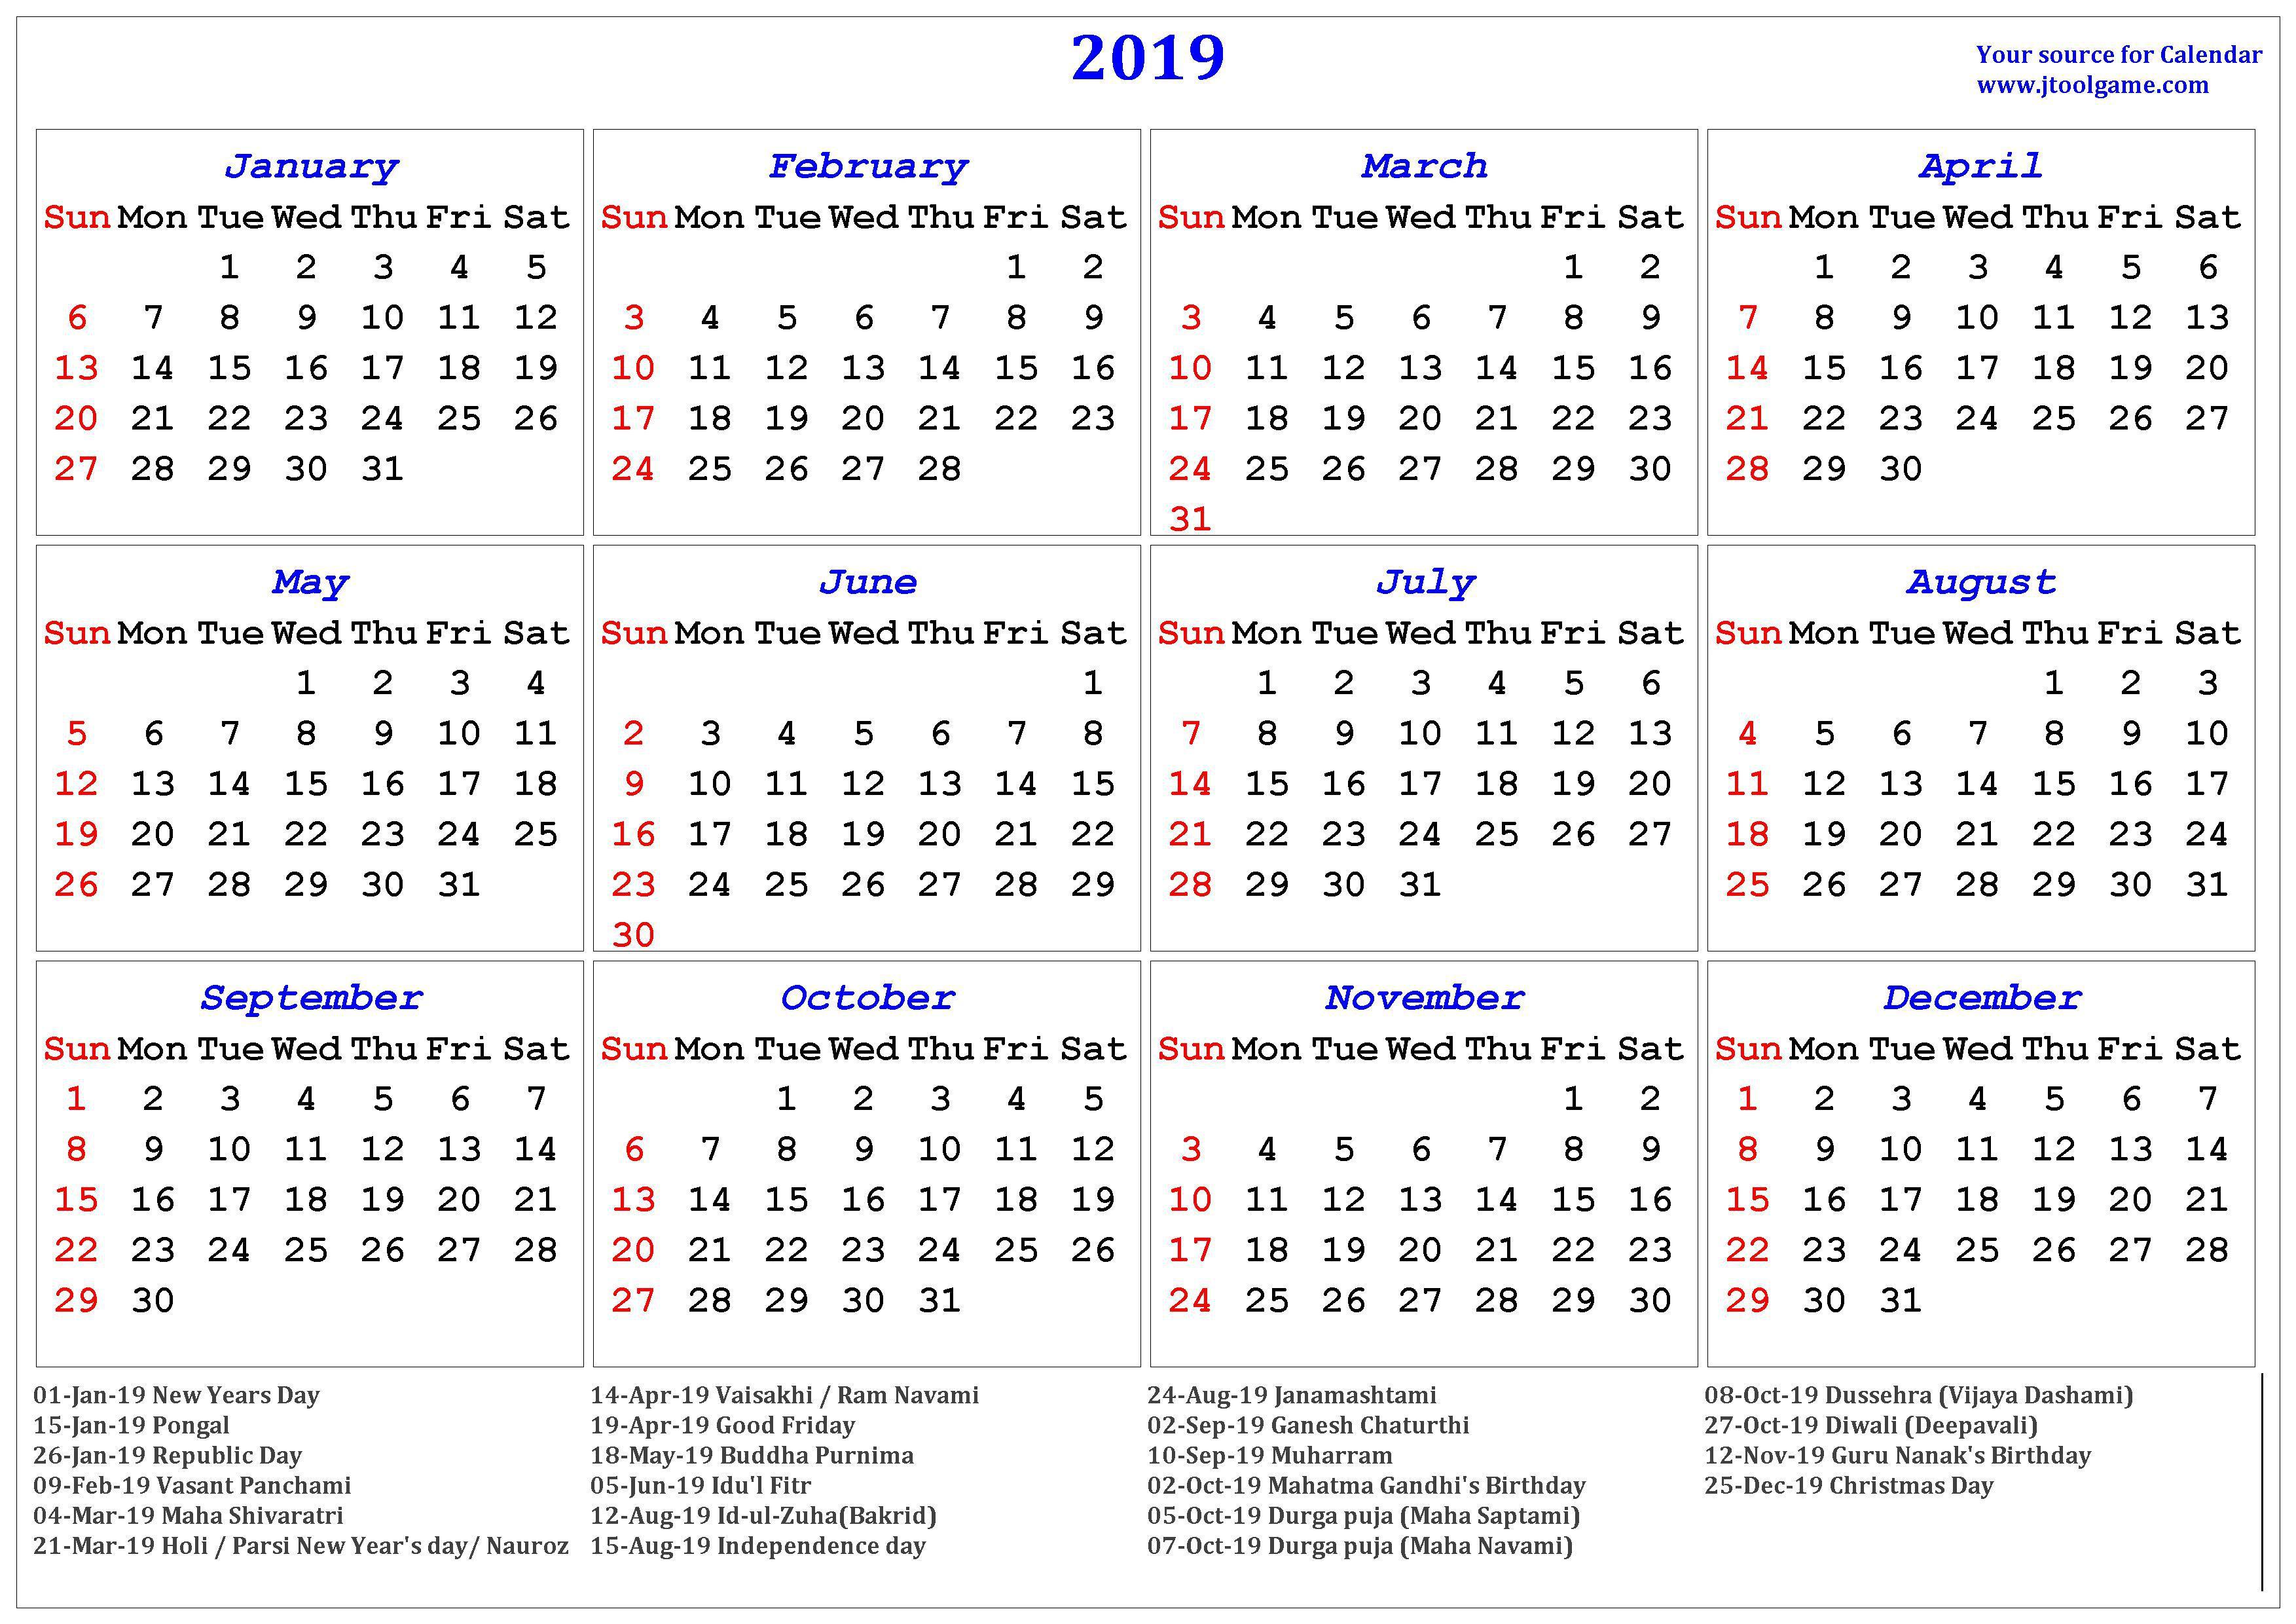 2019 Hindu Calendar With Tithi